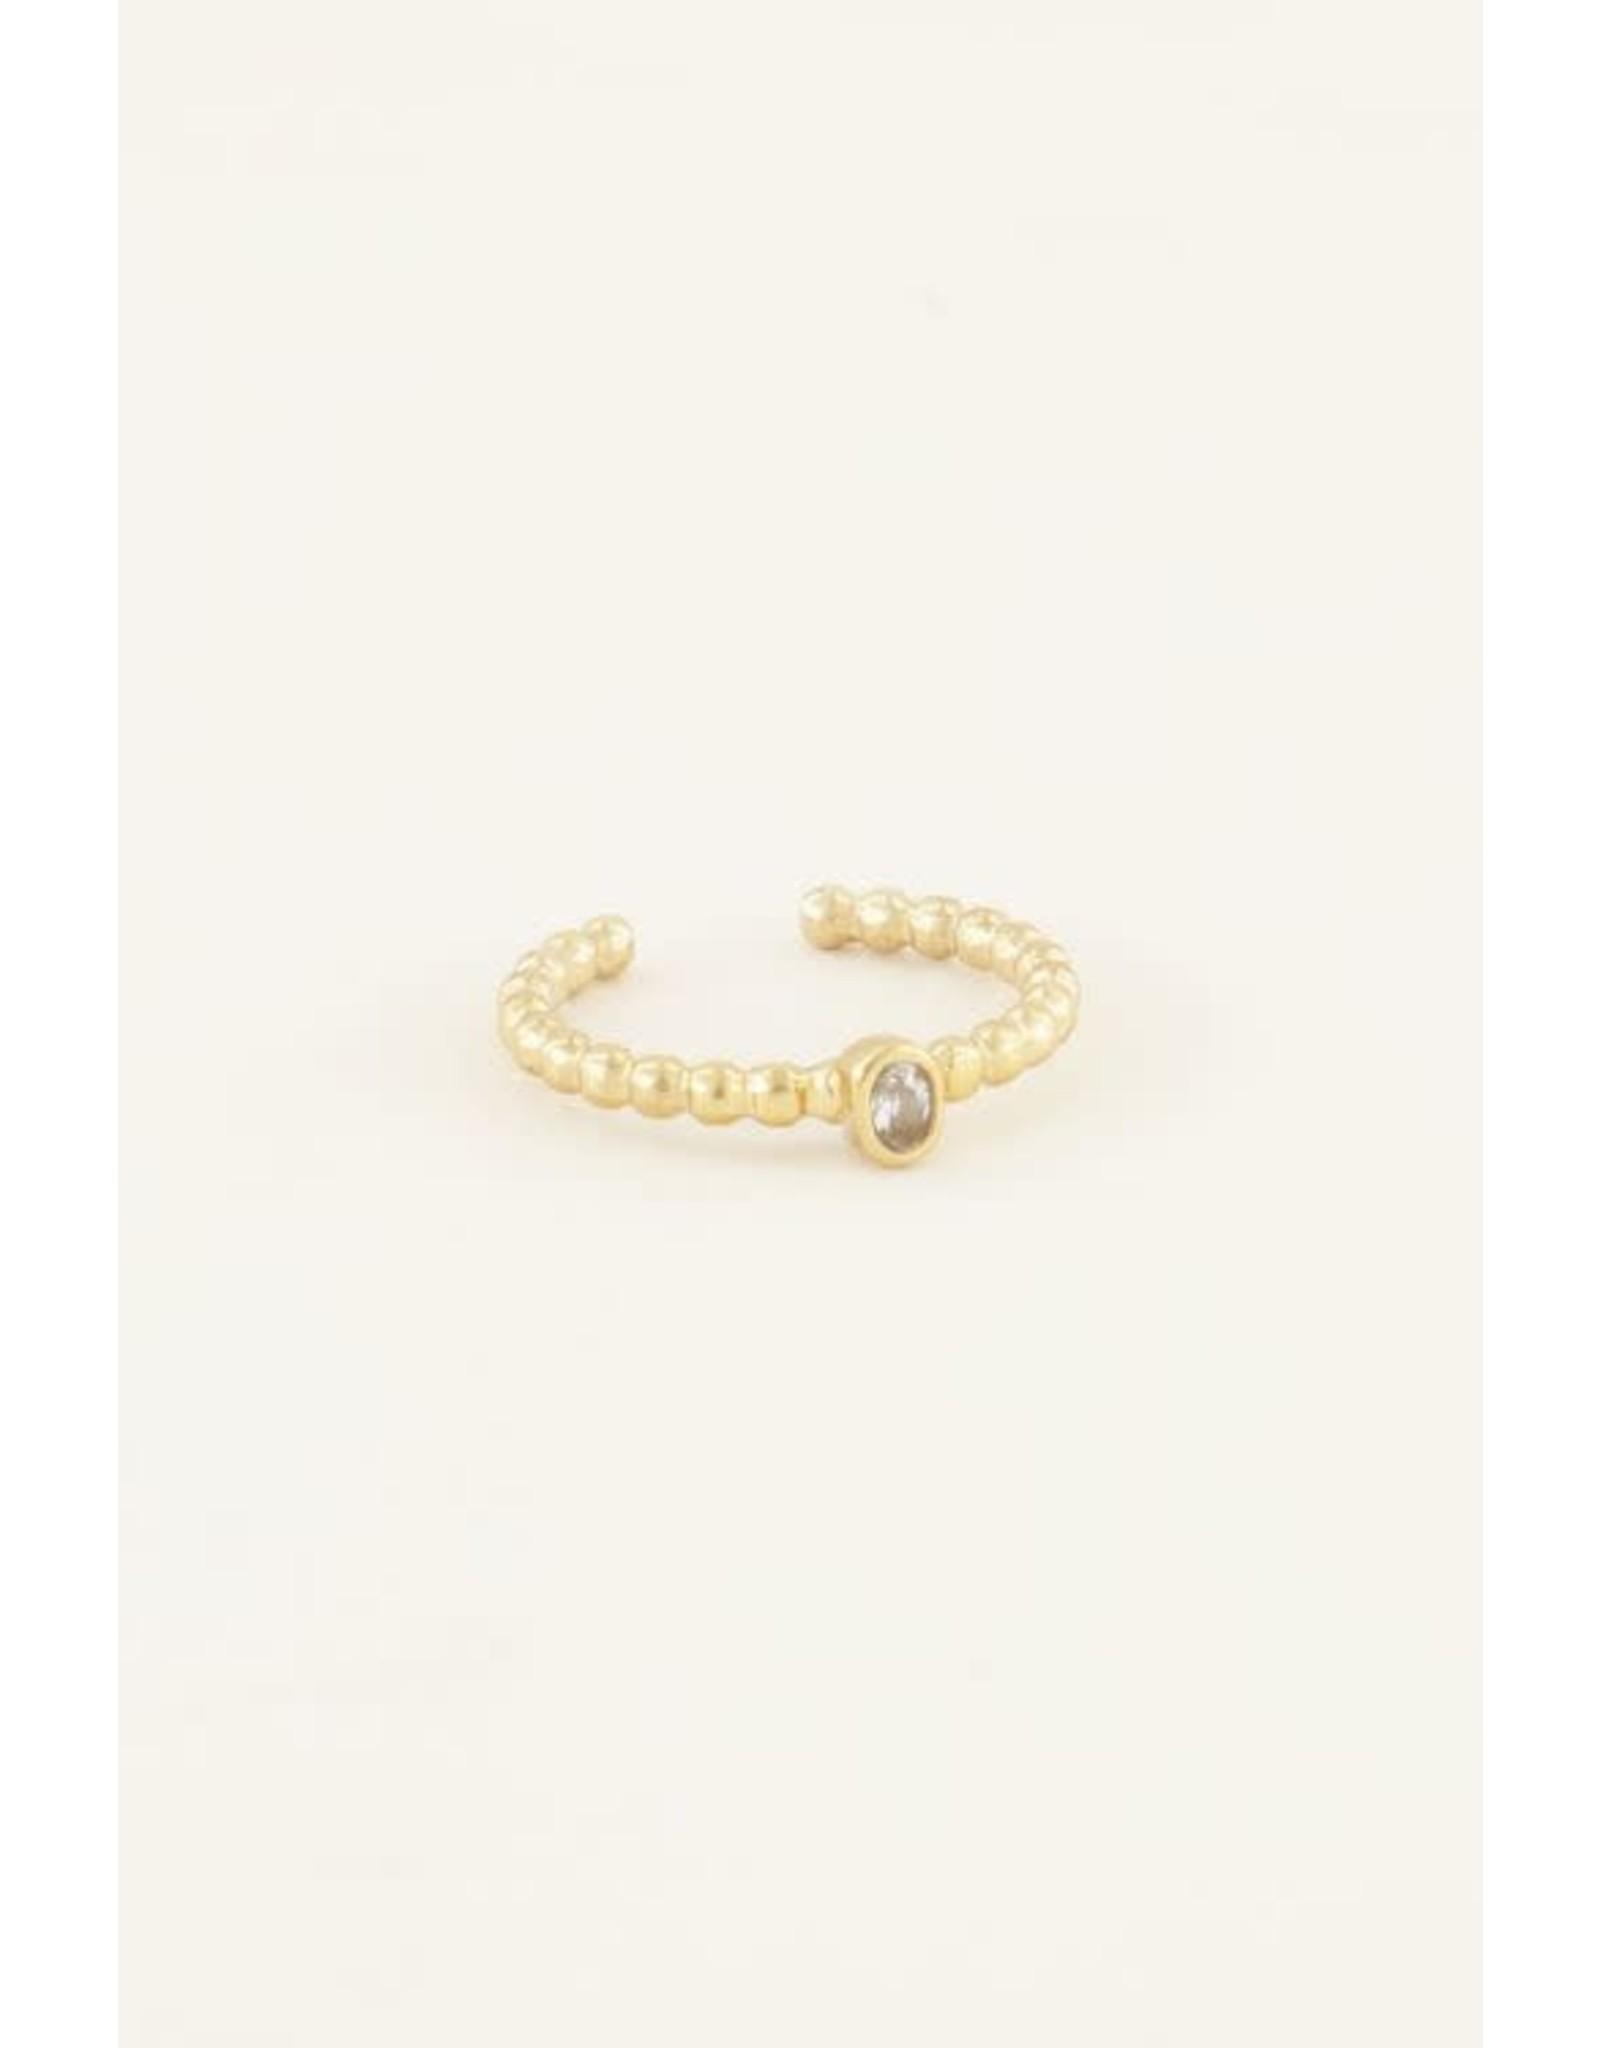 My Jewellery My Jewellery geboortesteen ring april goud